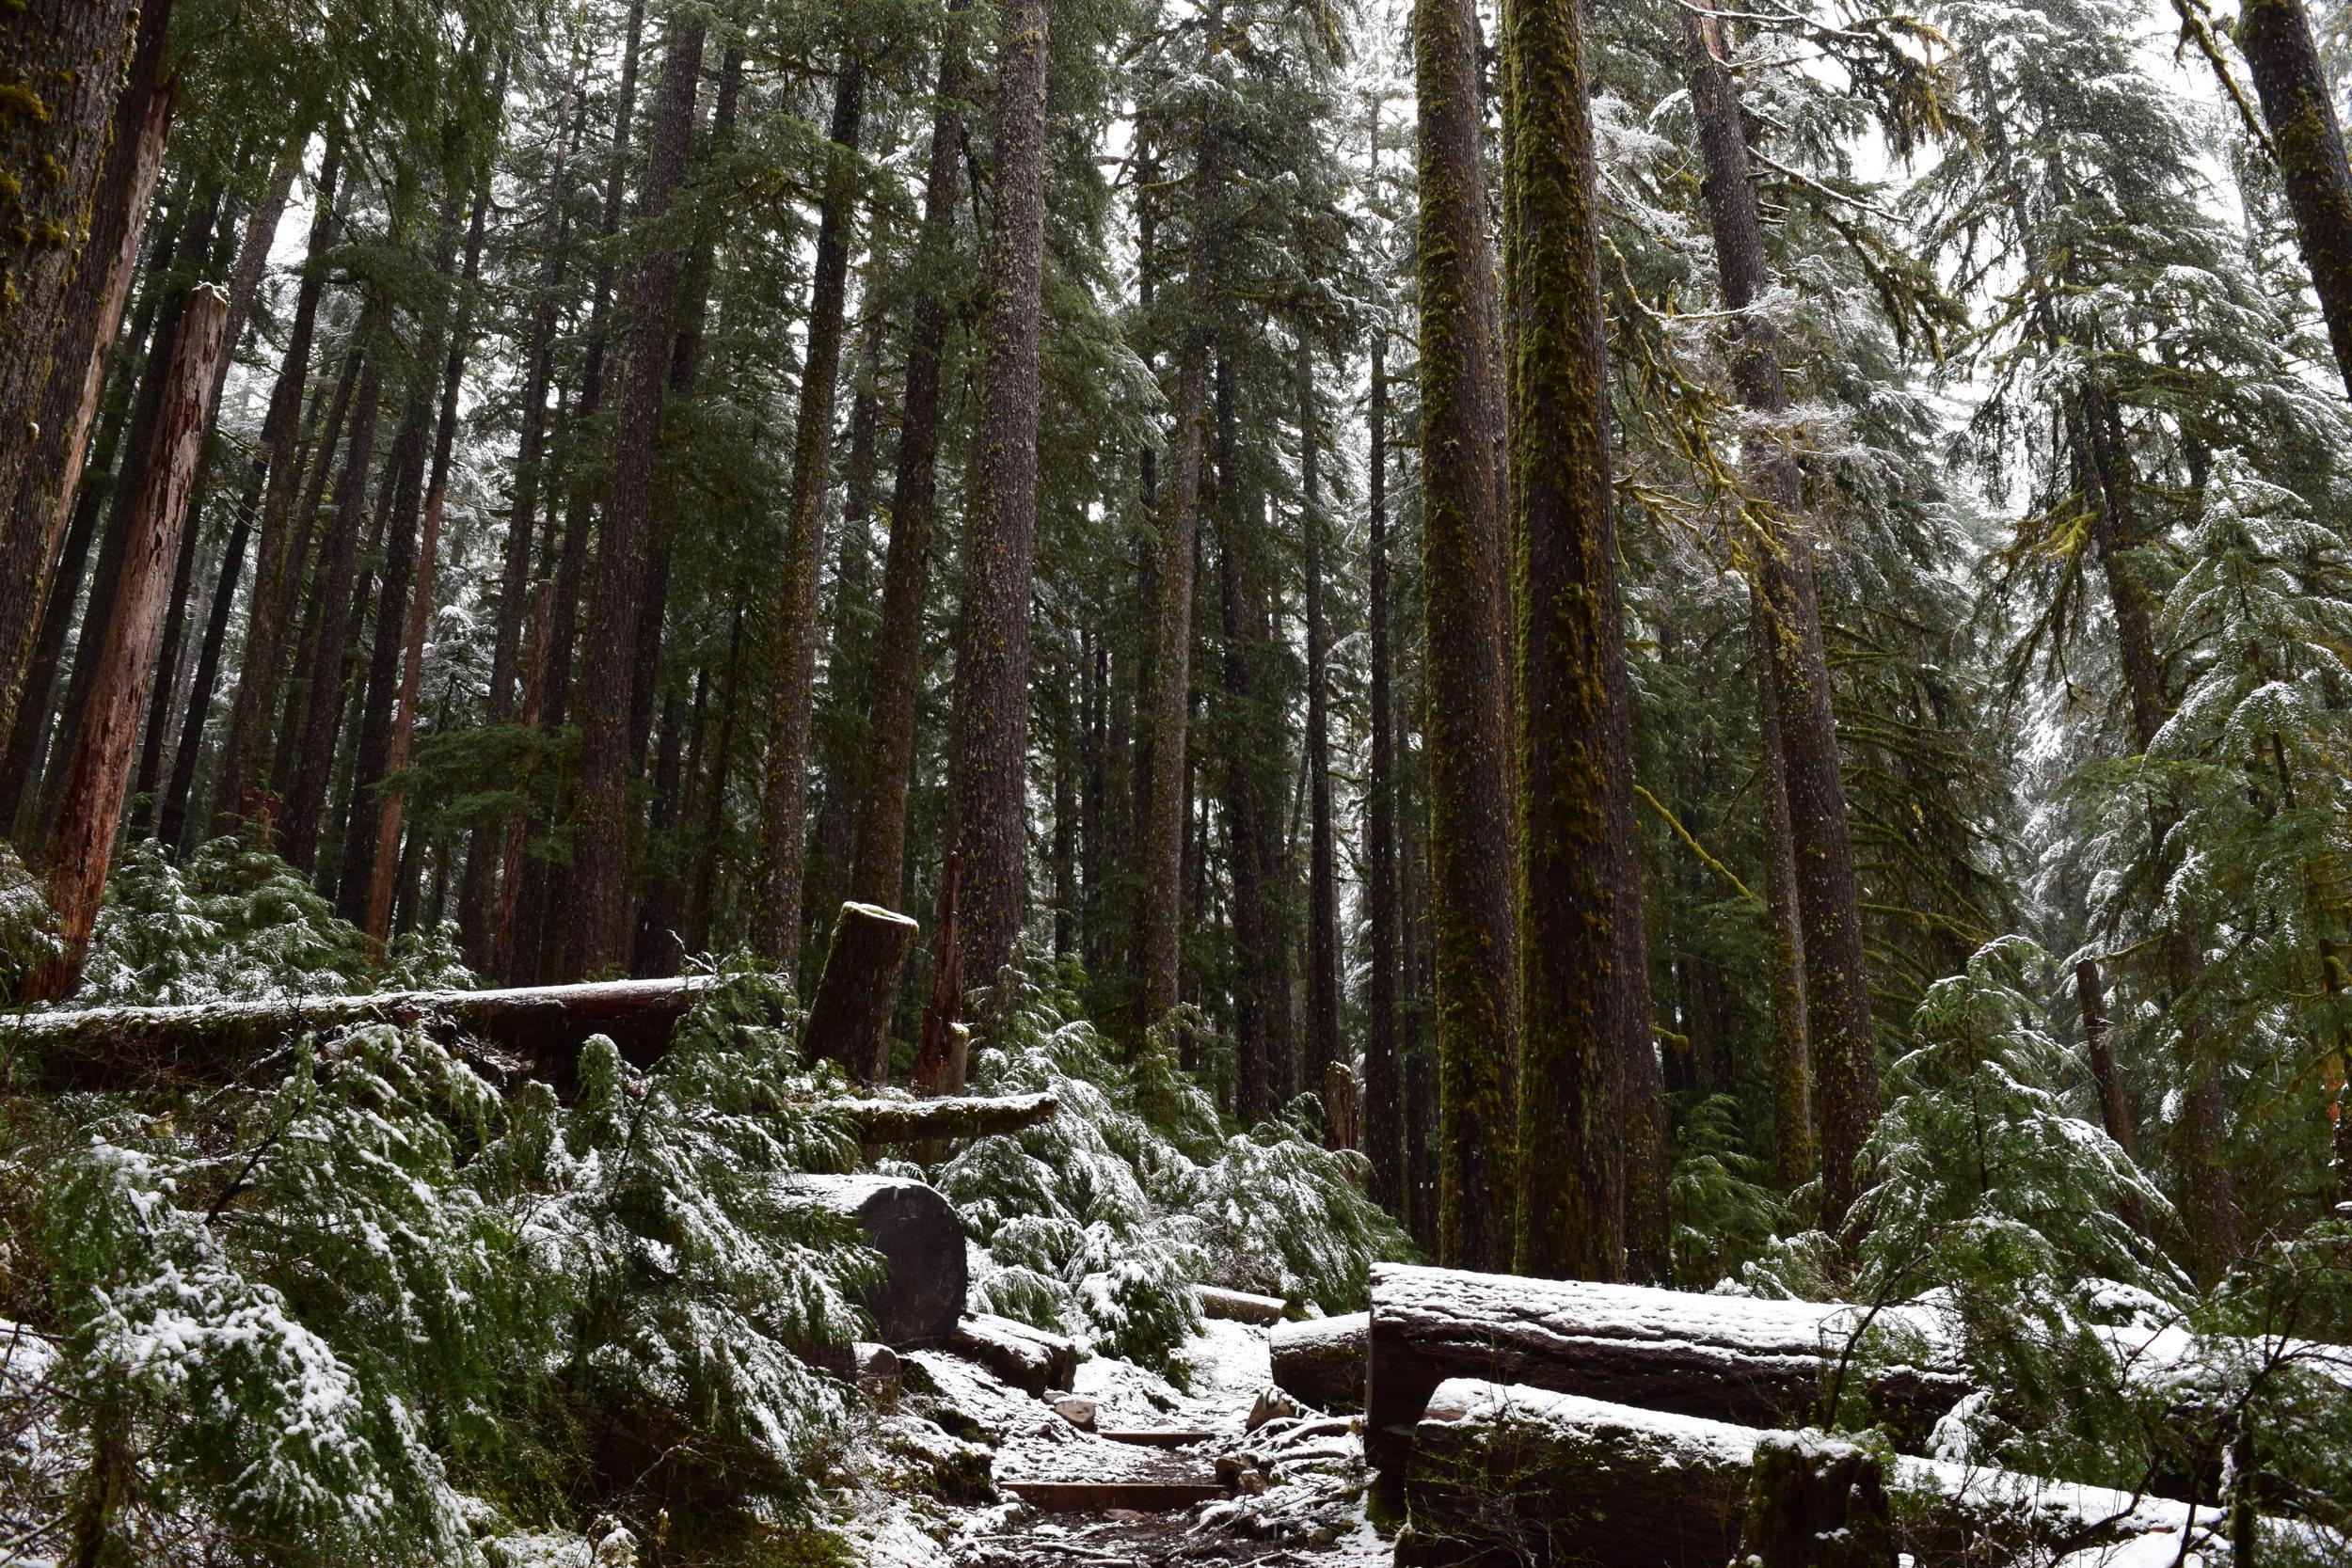 Sol Duc Trail #1